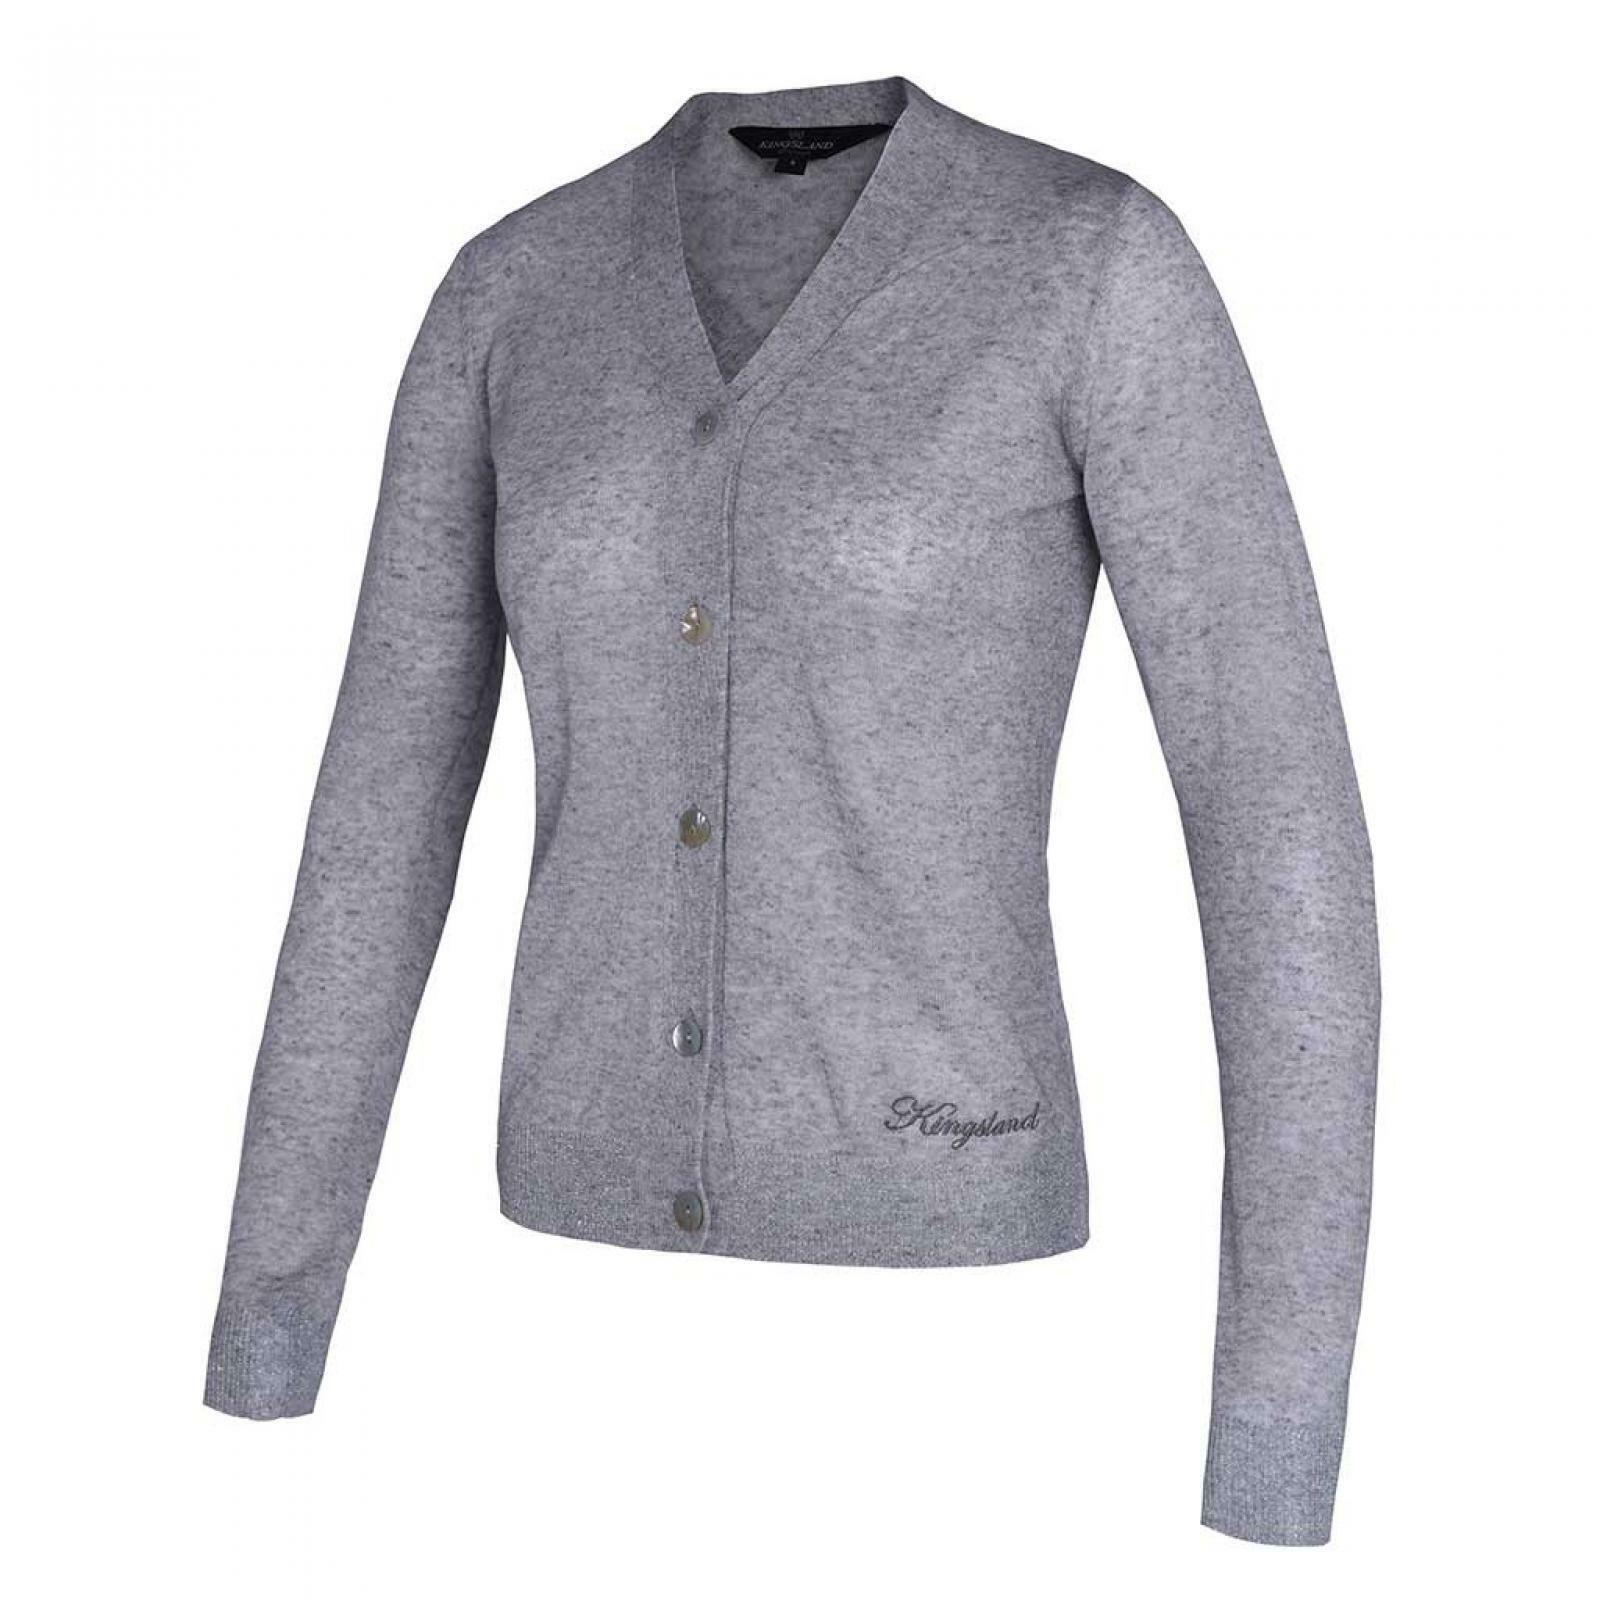 Kingsland Posadas Knitted Cardigan l.gris S19 Dressage